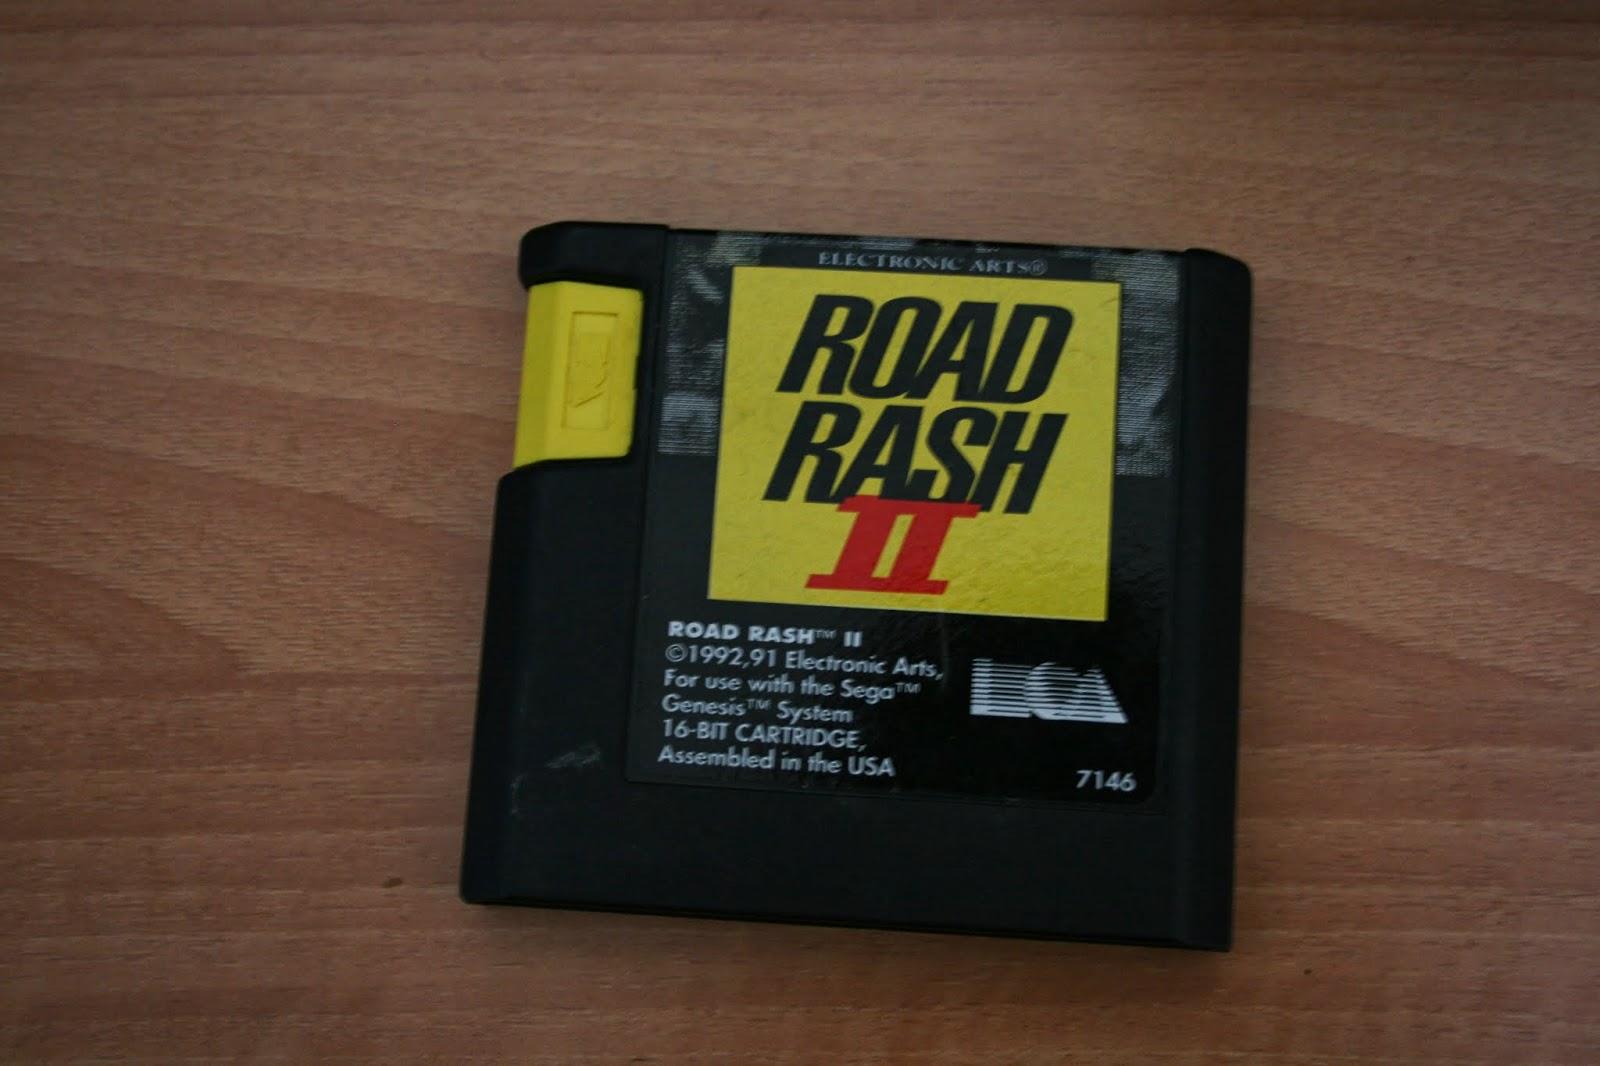 Road Rash II for Mega Drive